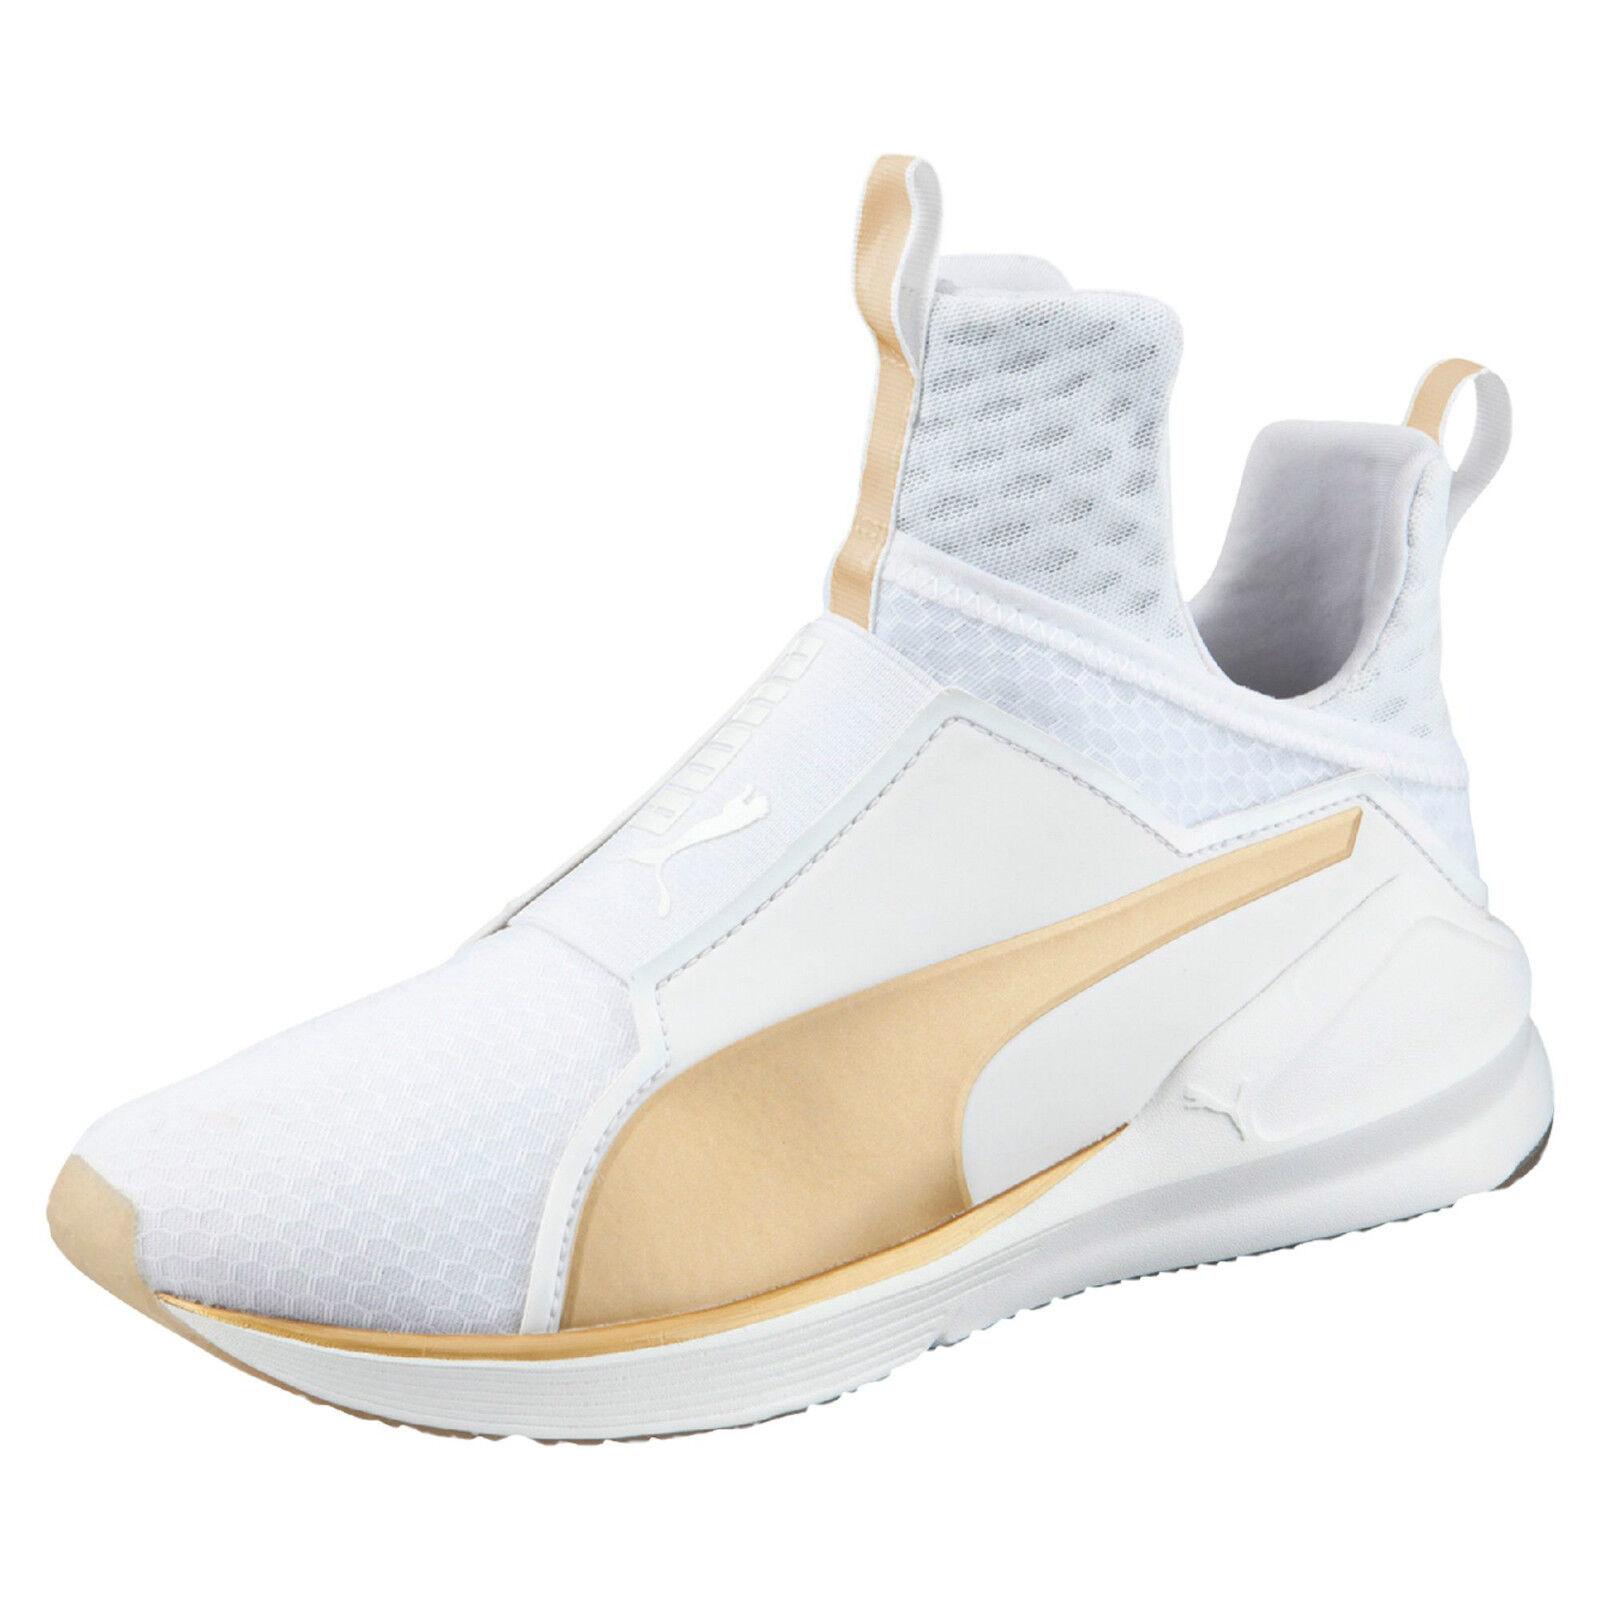 PUMA FUMA Baskets FIERCE GOLD Blanc Or Baskets FUMA White Sneakers Fenty Rihanna 6c0a97